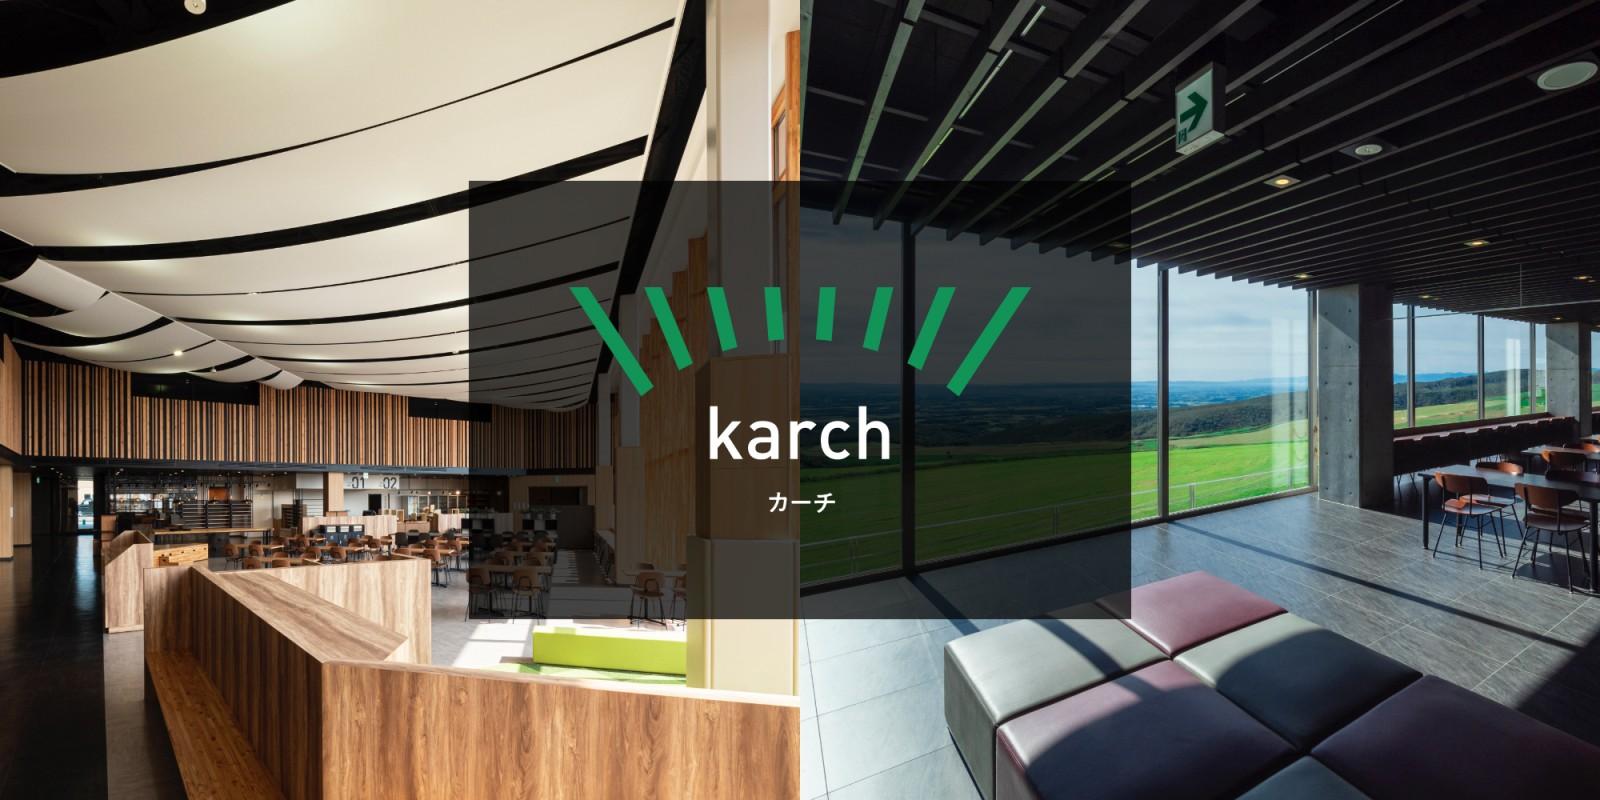 株式会社karch